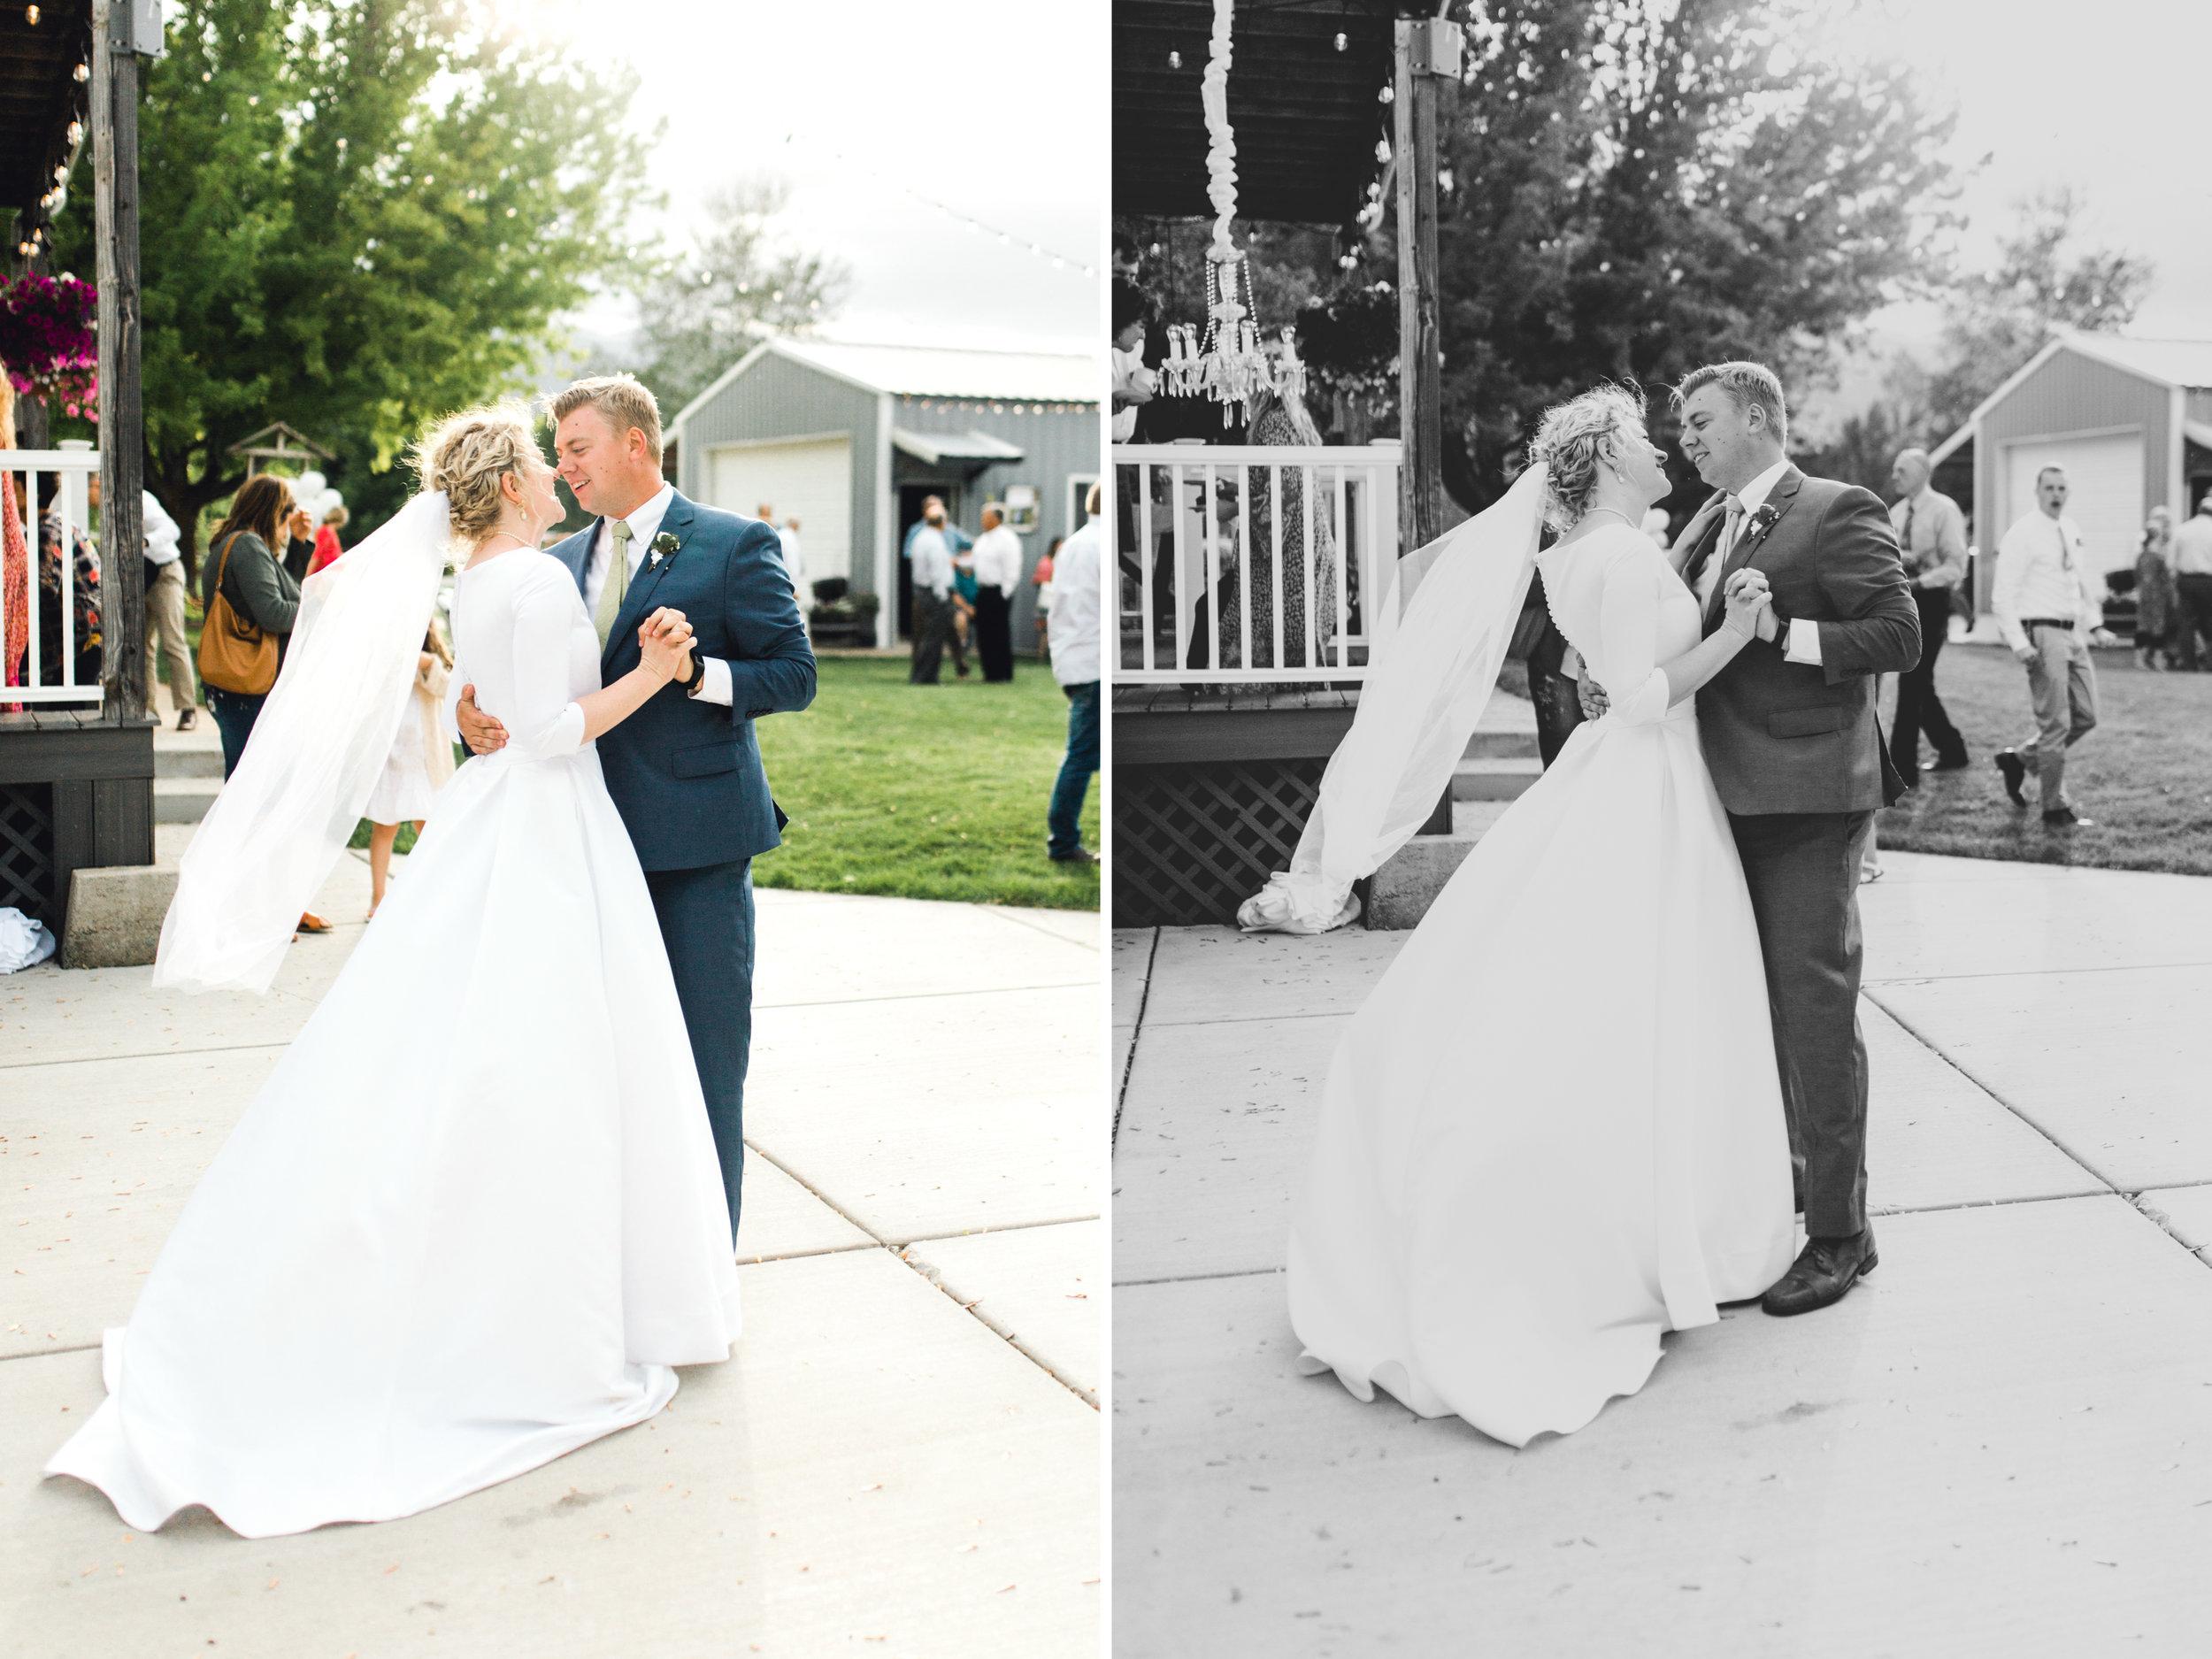 beautiful-outdoor-backyard-wedding-reception-anna-christine-photography-rexburg-idaho-17.jpg